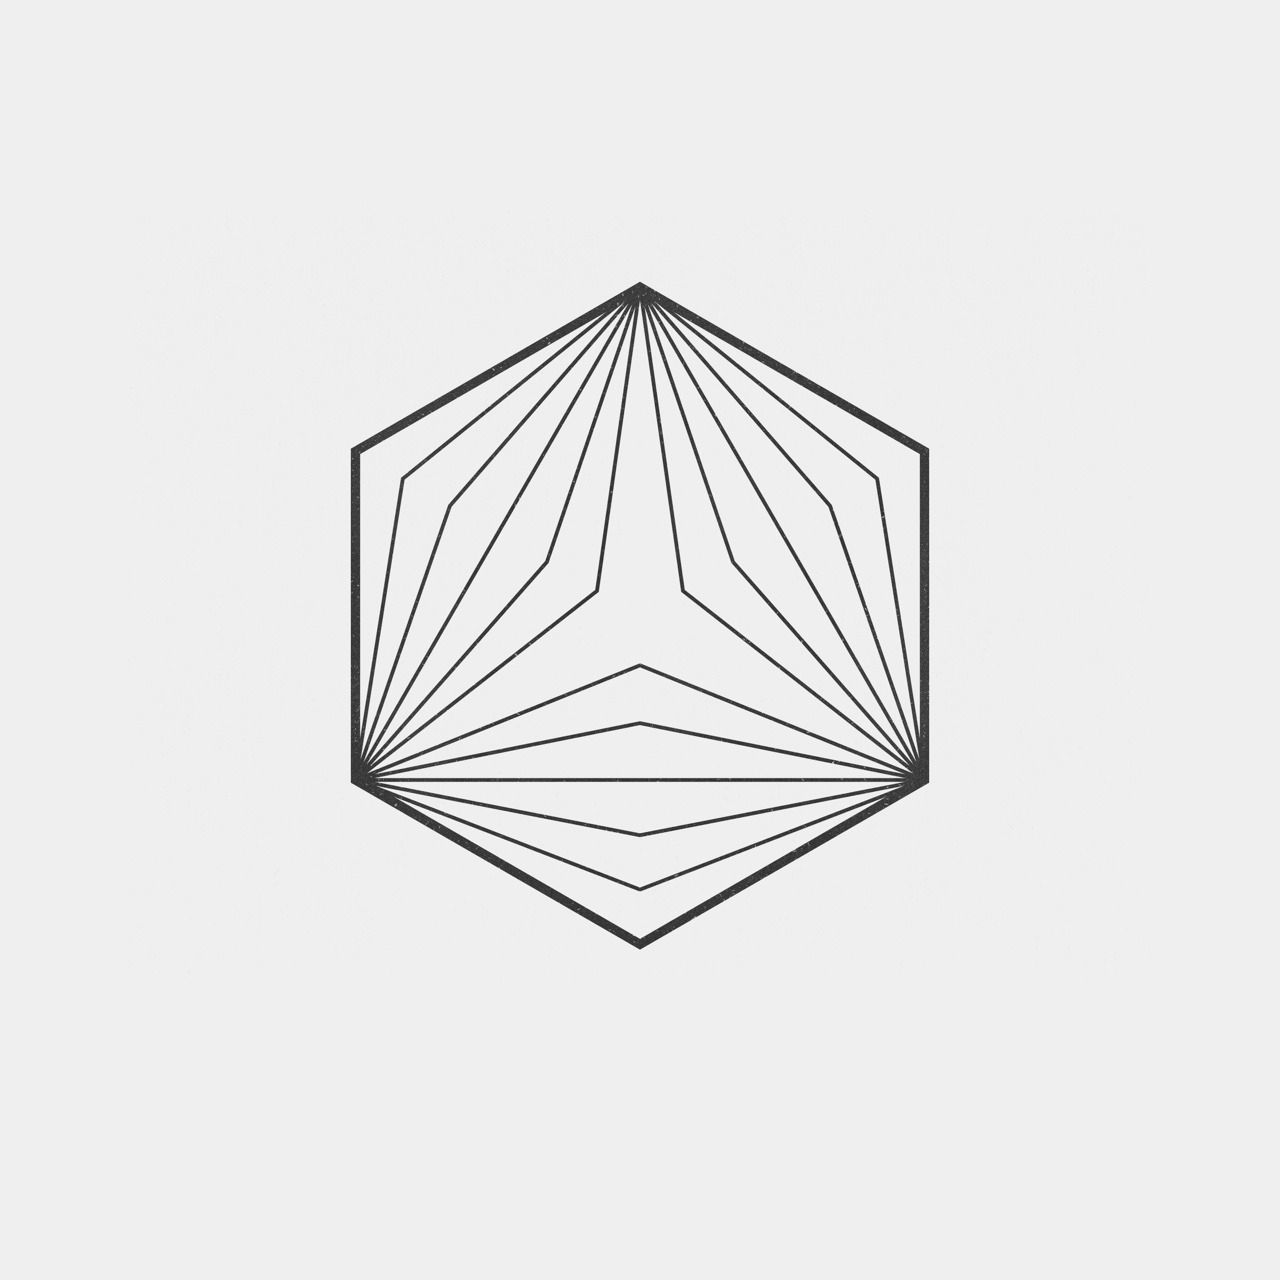 Art Of Geometry Art Abstract Minimalism Shapes Geometric